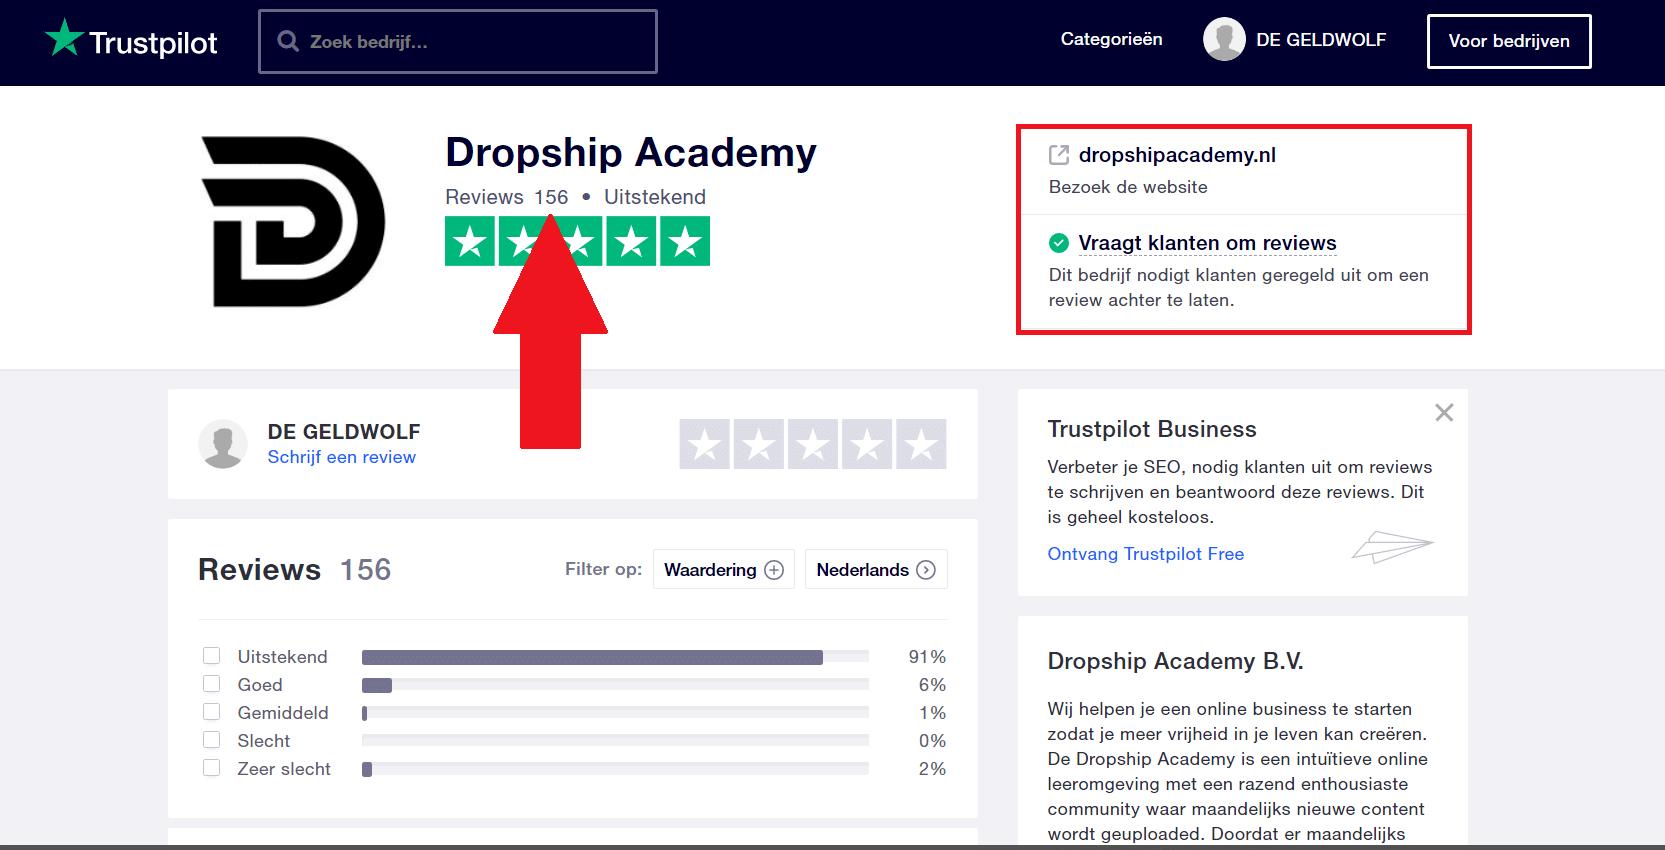 dropship academy trustpilot